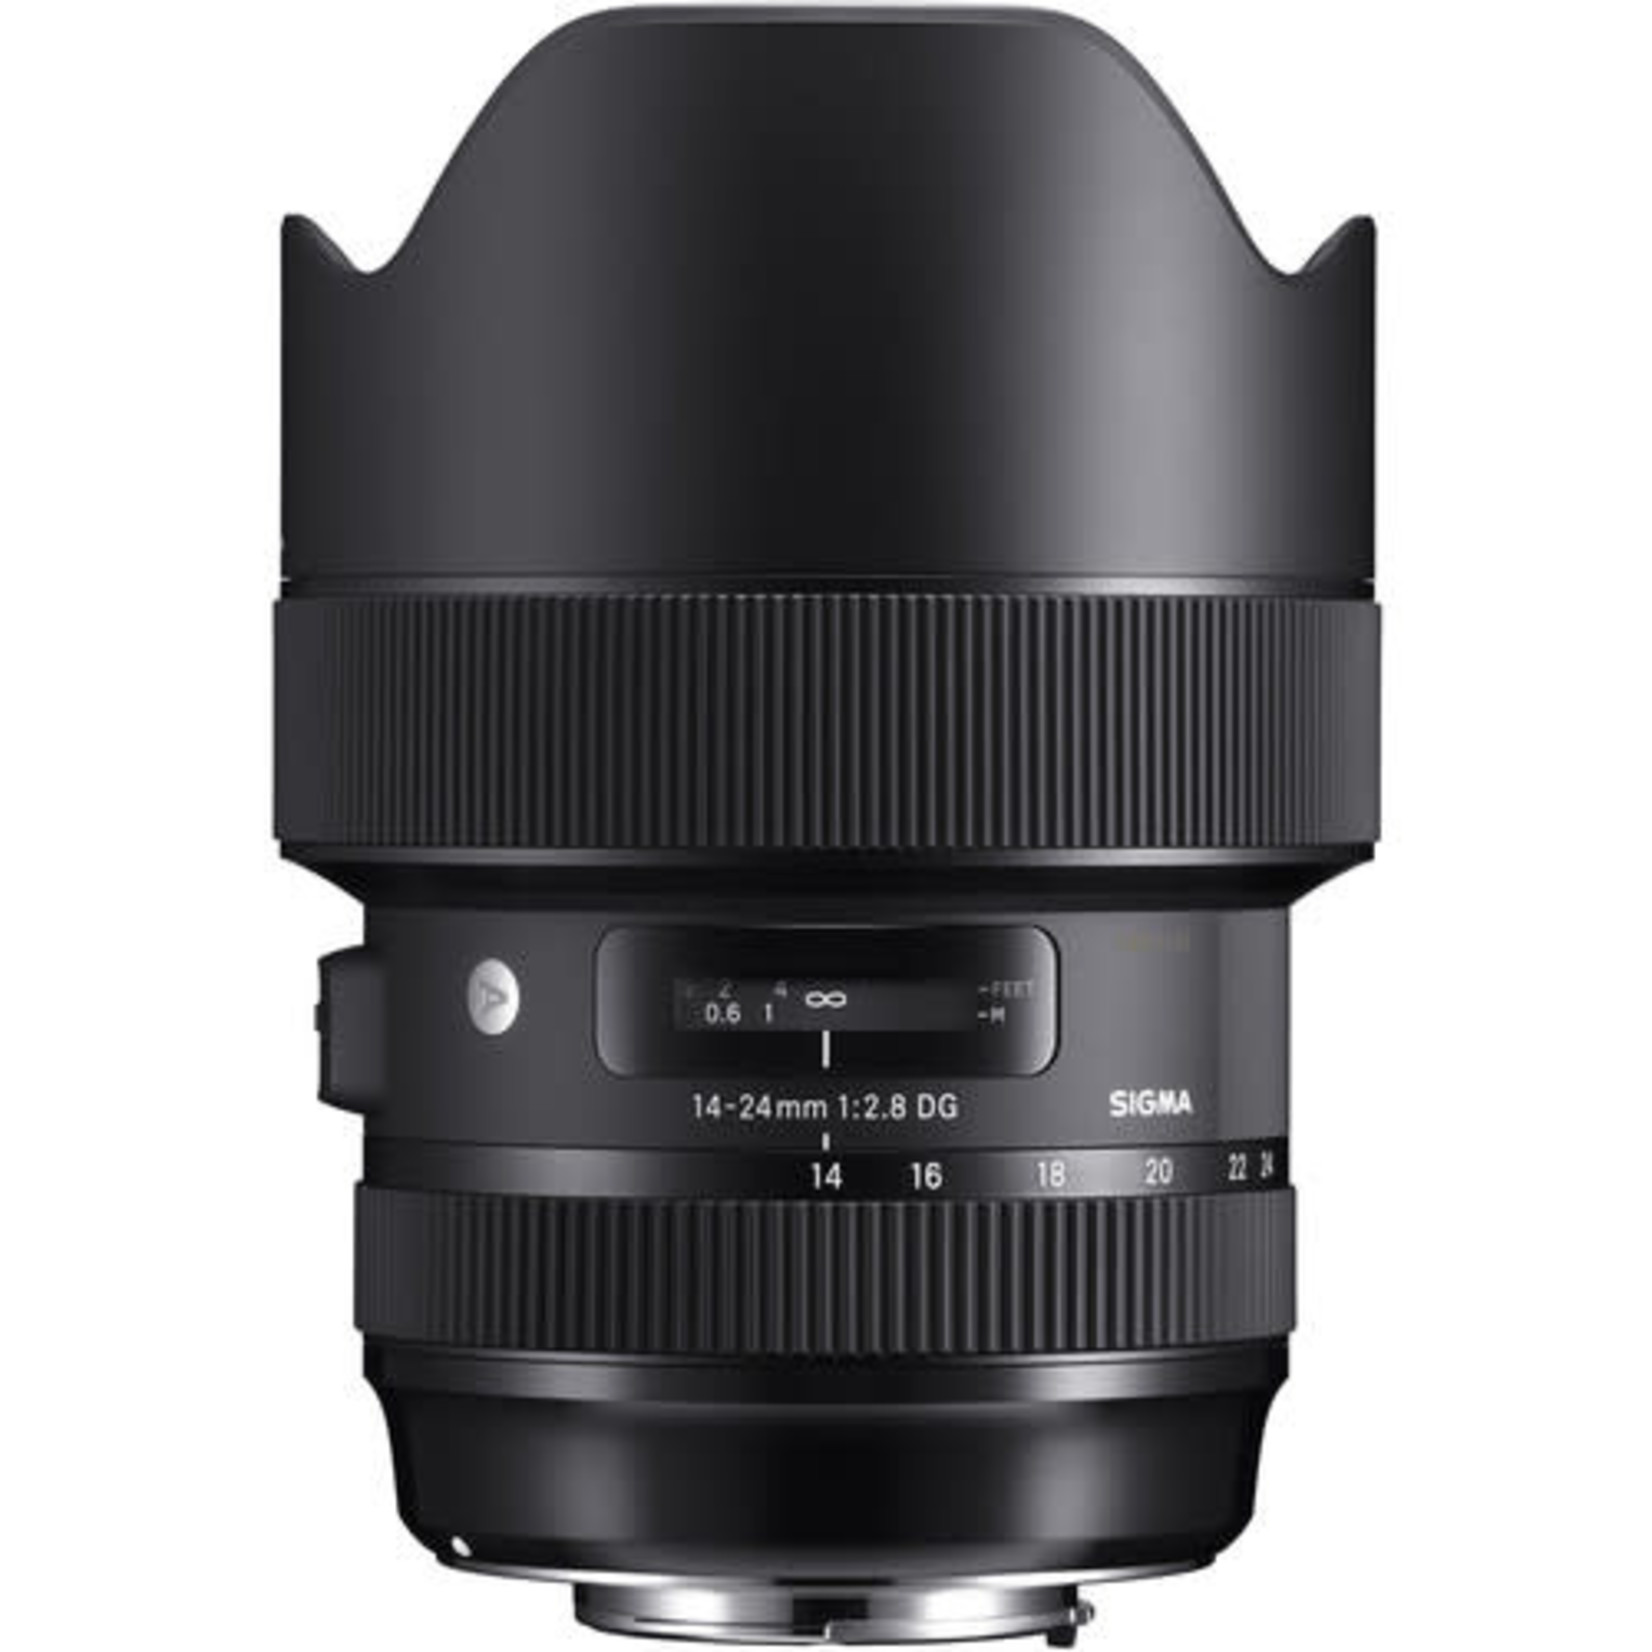 Sigma Sigma 14-24mm f/2.8 DG HSM Art Lens for Nikon F